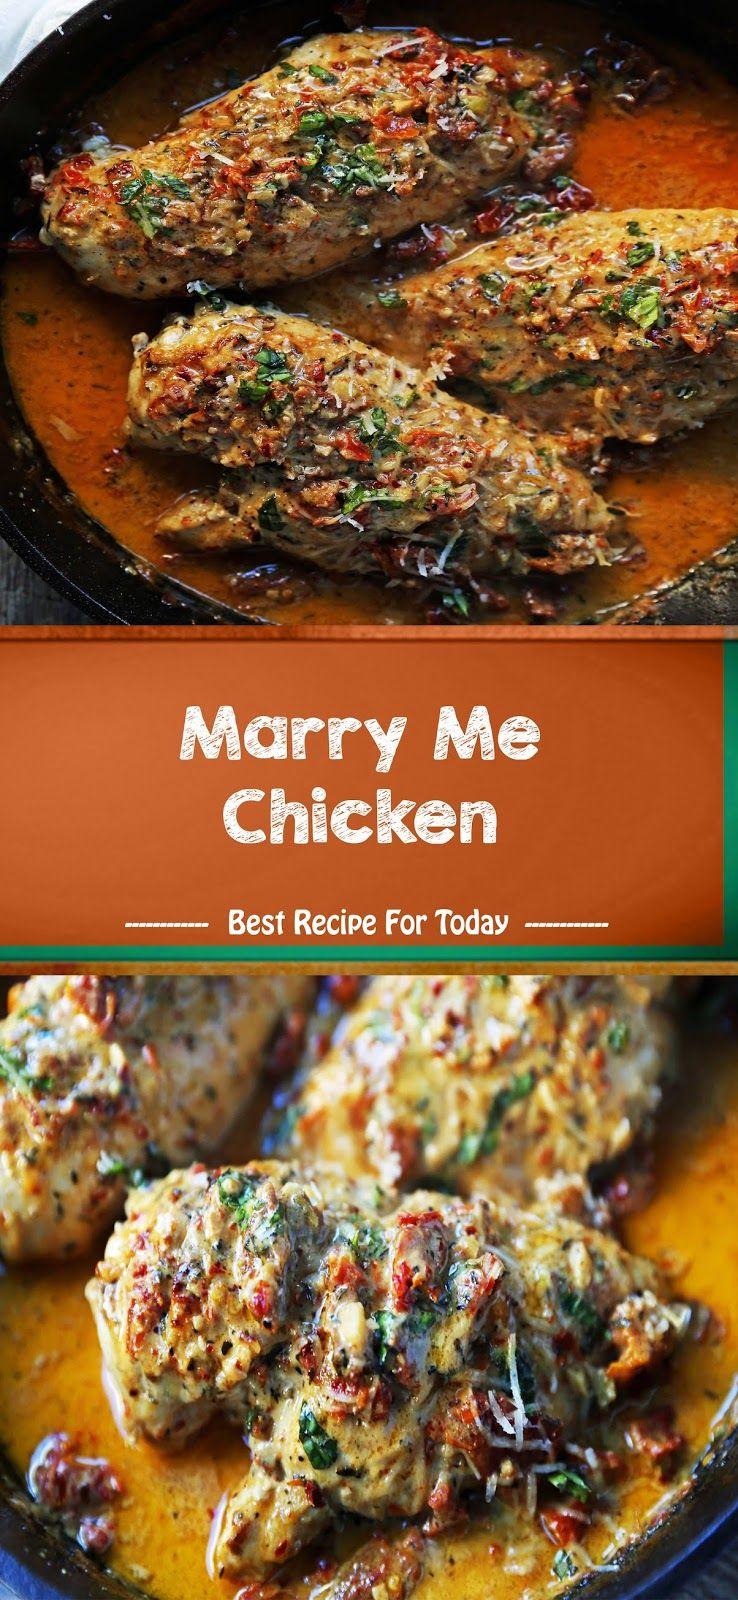 Marry Me Chicken | Healthy Recipes #marrymechicken